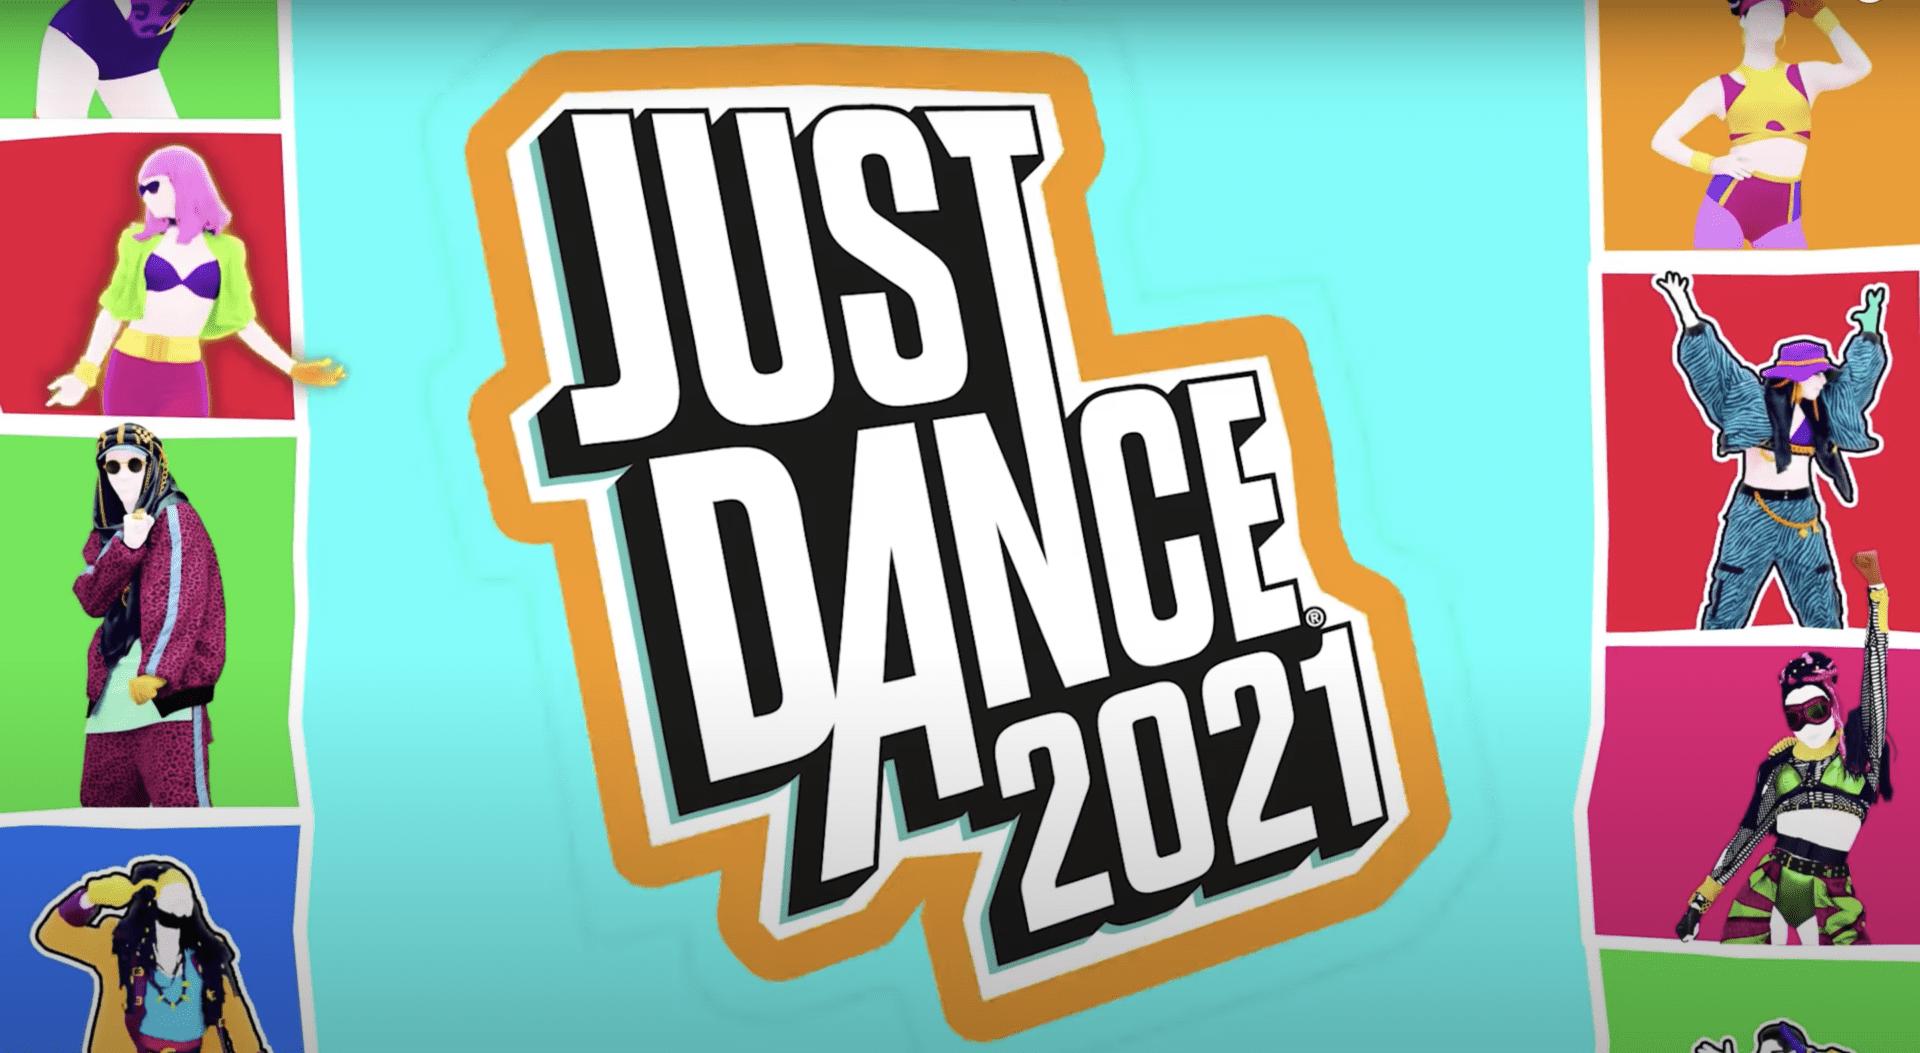 Just Dance 2021, announcement trailer, Nintendo Direct